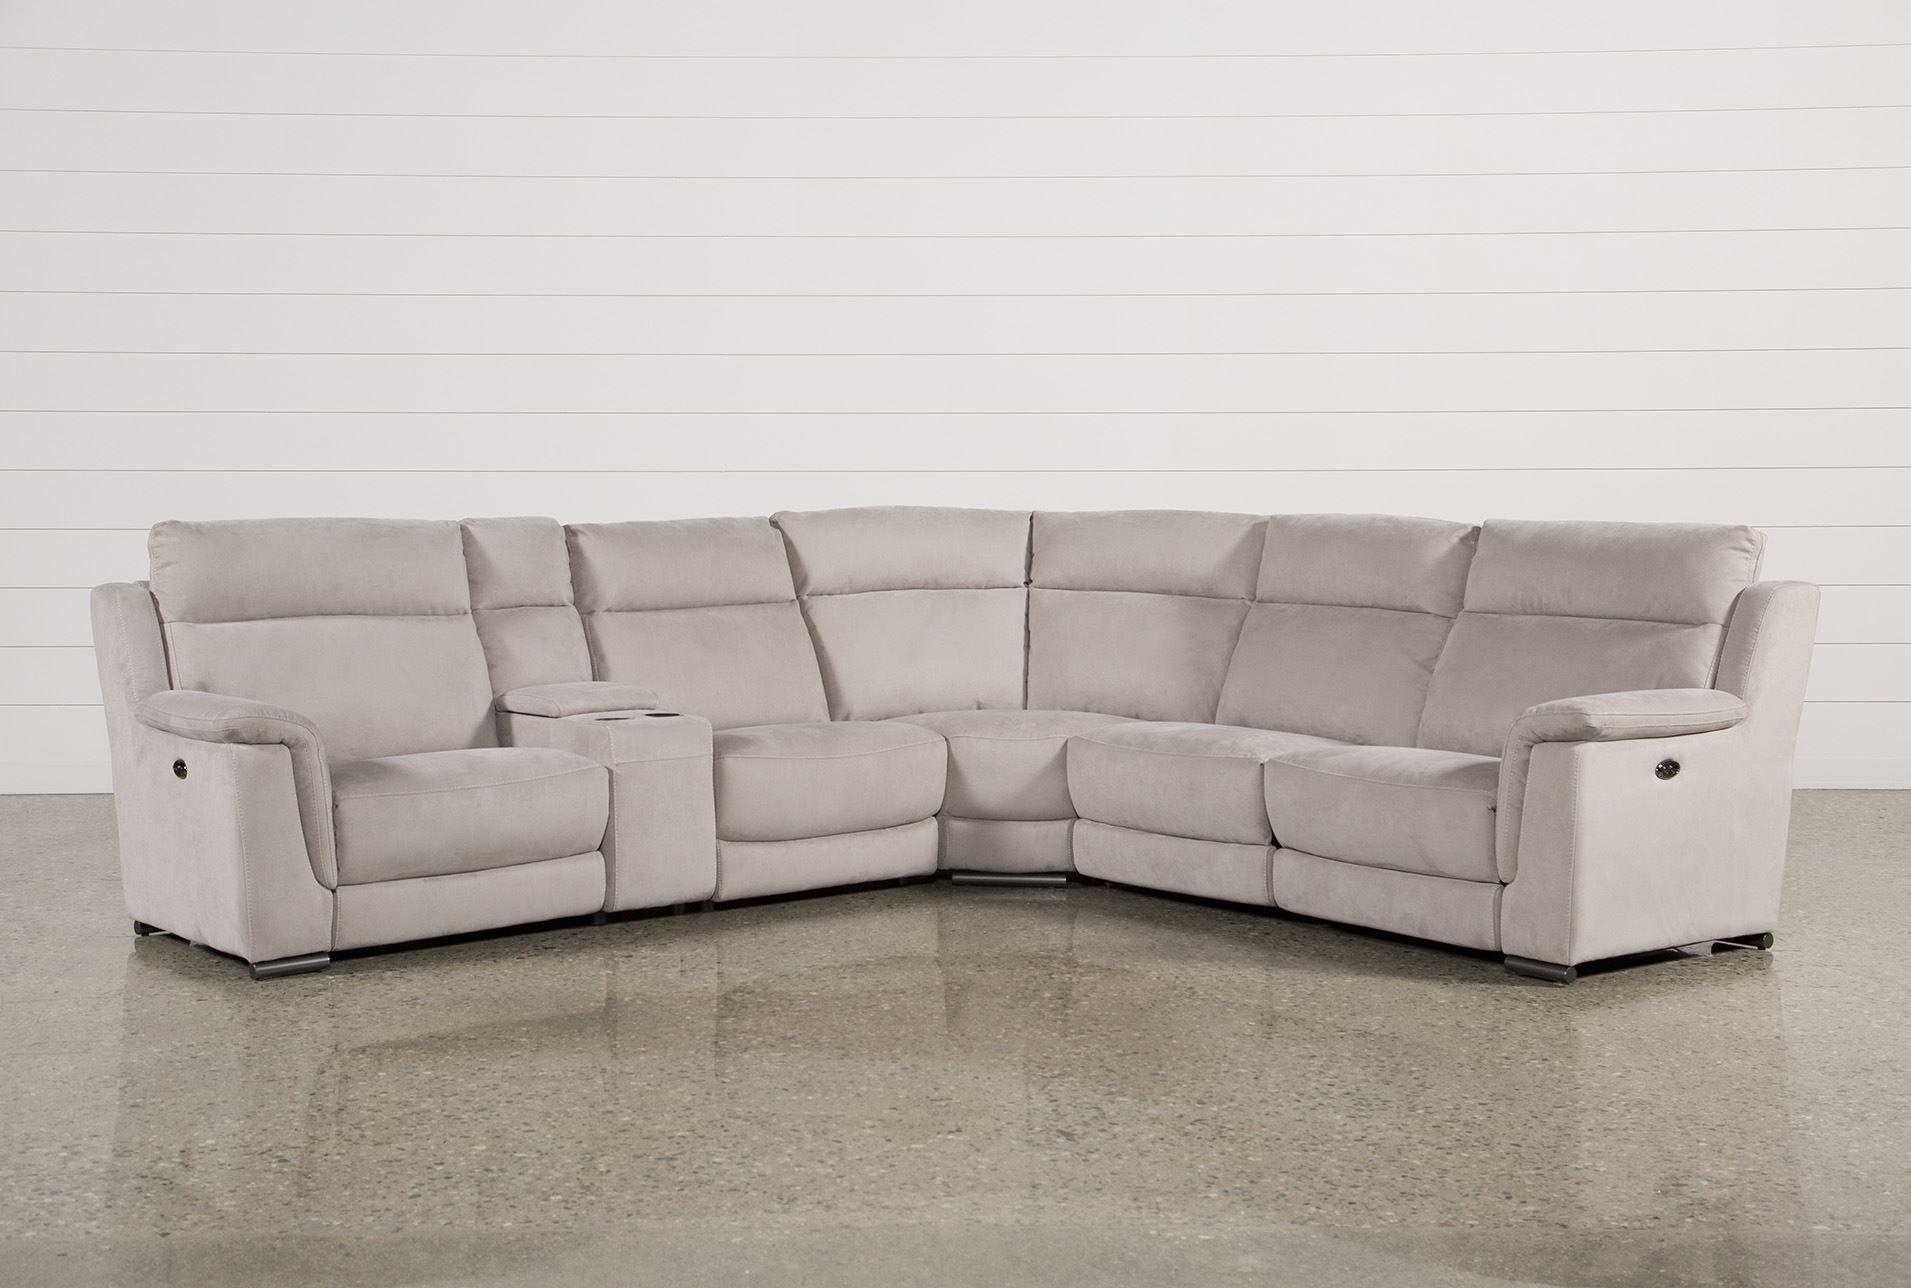 6 Piece Power Reclining Sectional Kerwin Silver Grey Sofas